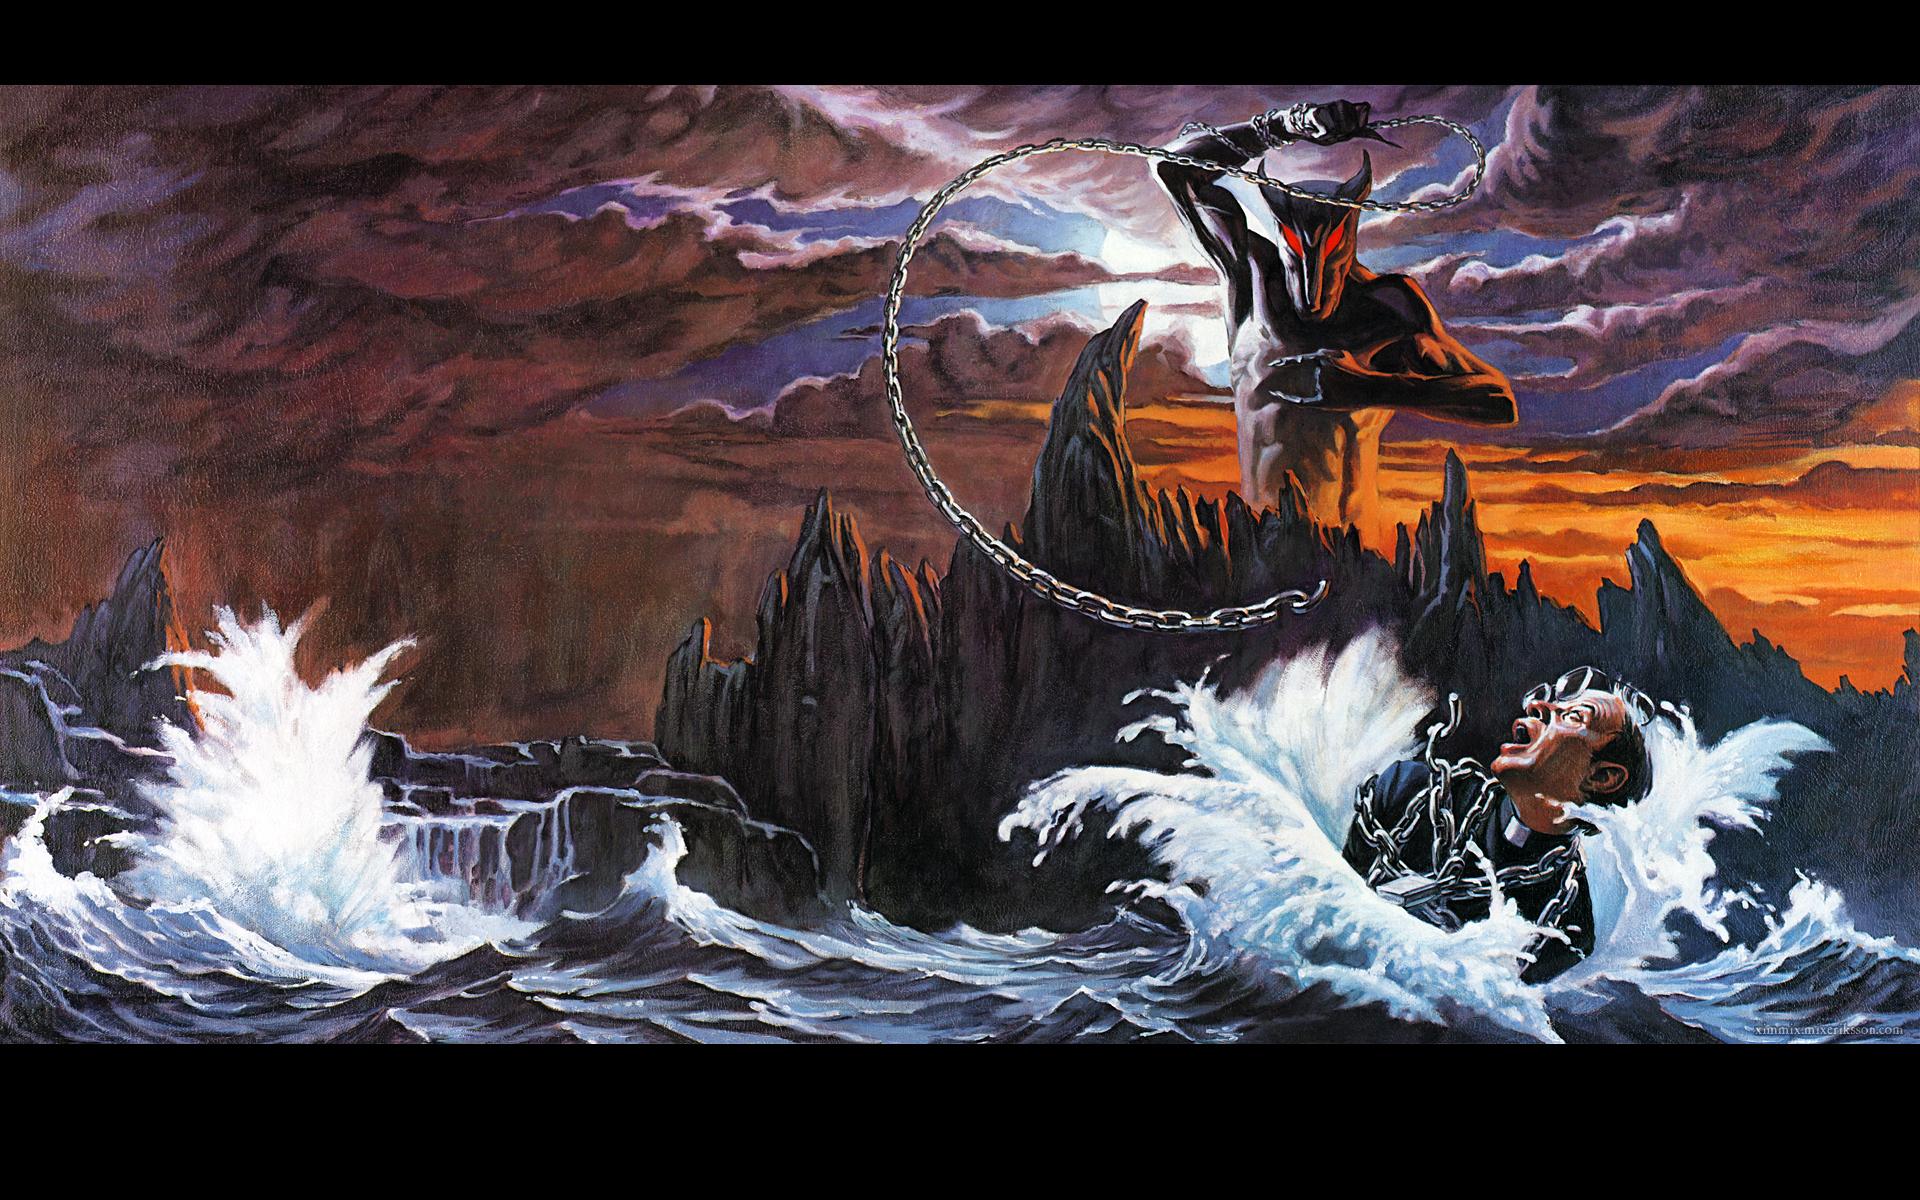 Dio HD Wallpaper Background Image 1920x1200 ID304593 1920x1200